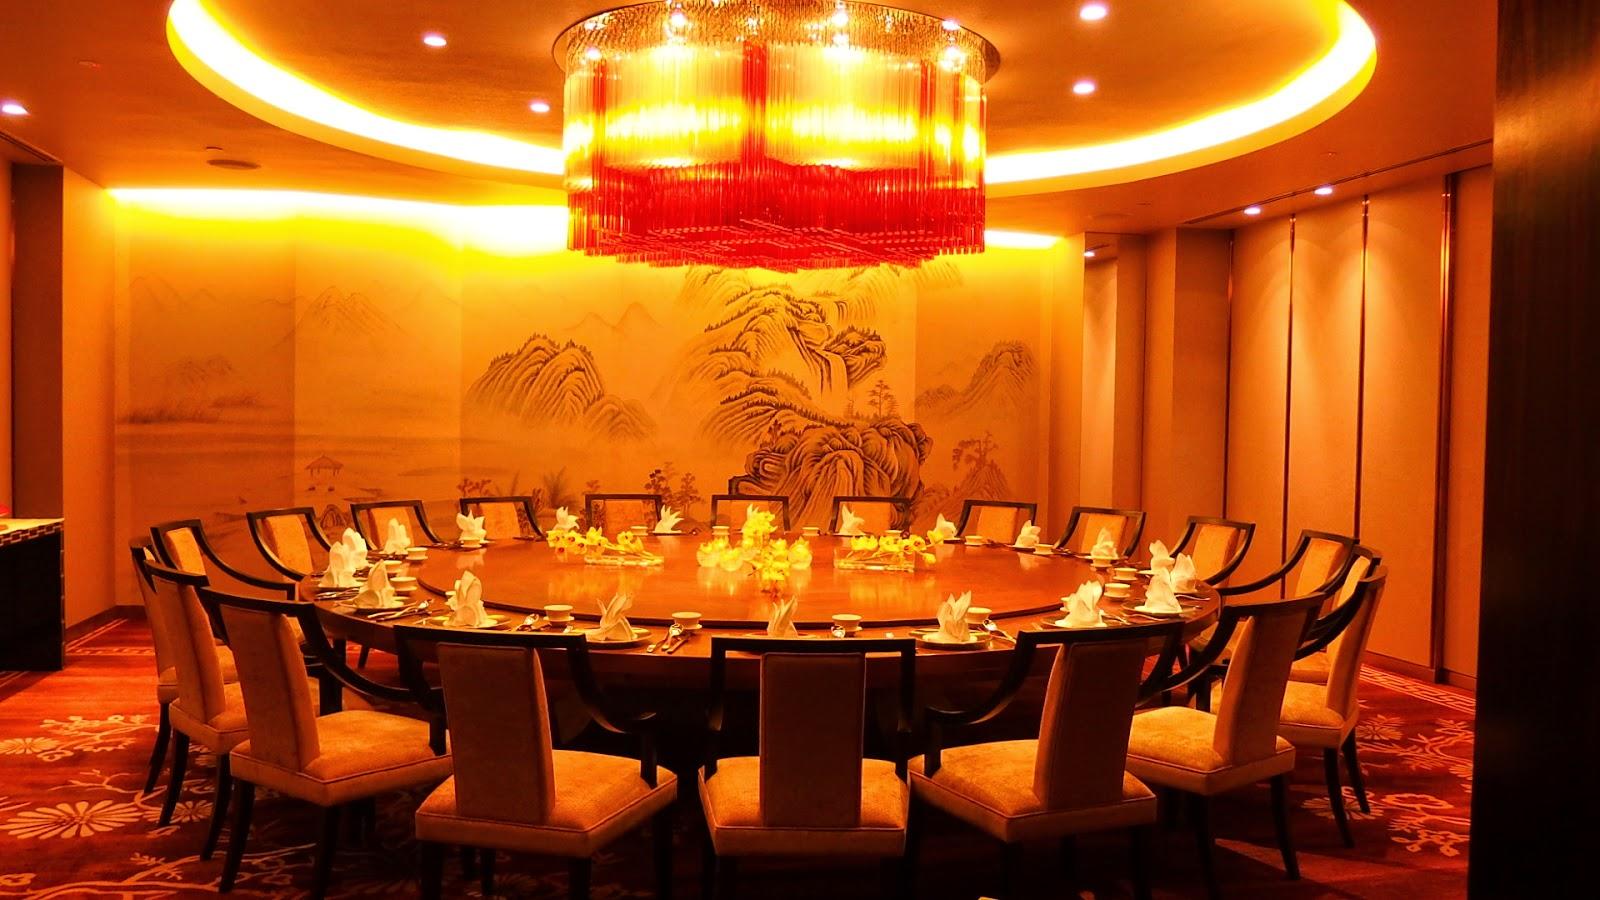 Exquisite New Menu at Hai Tien Lo, Pan Pacific Singapore: 7 – 31 Oct 2020